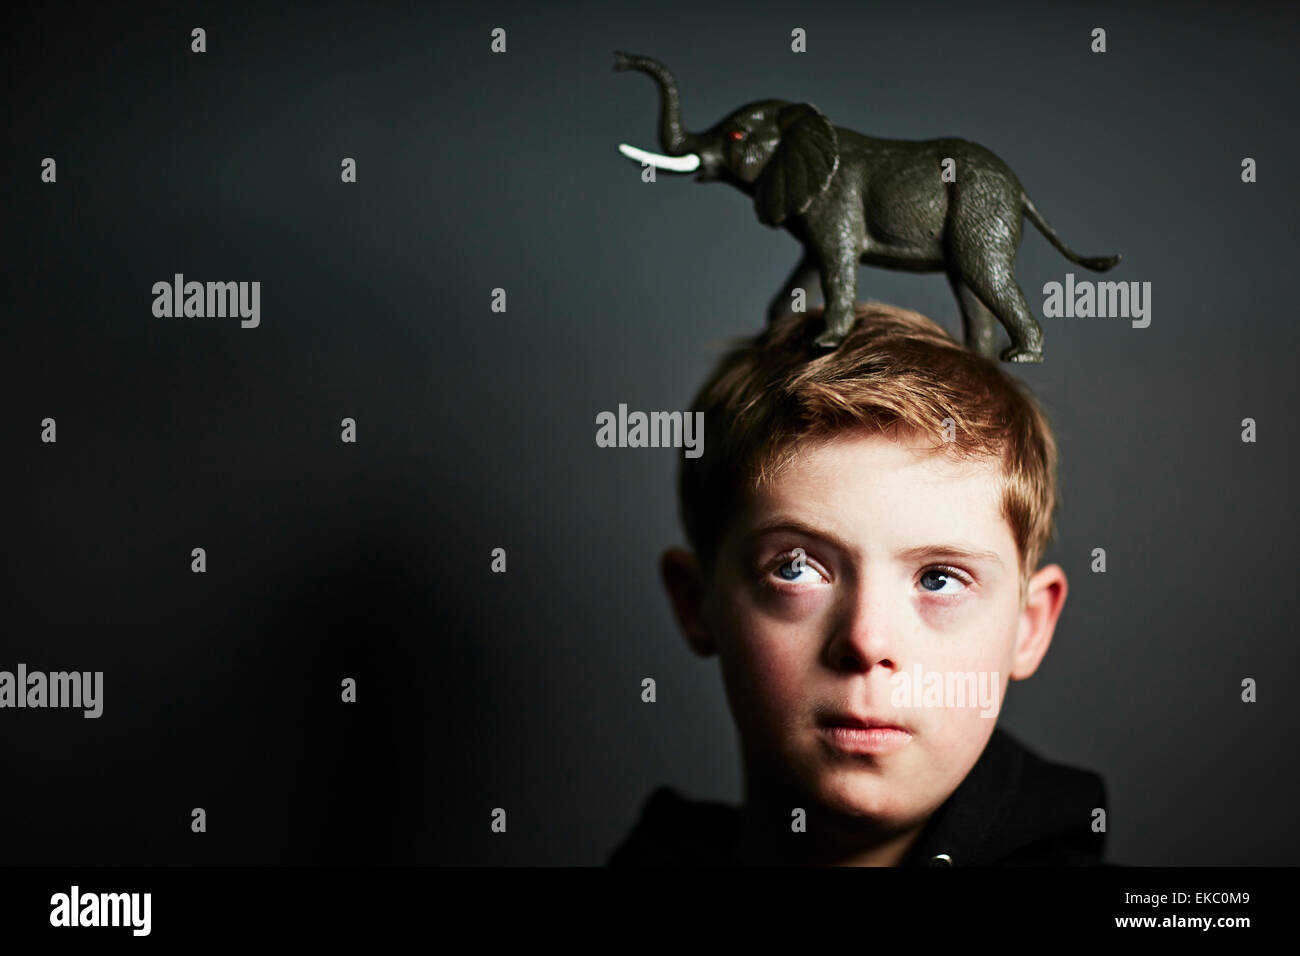 Junge mit Elefanten Spielzeug Kopfoberseite Stockbild